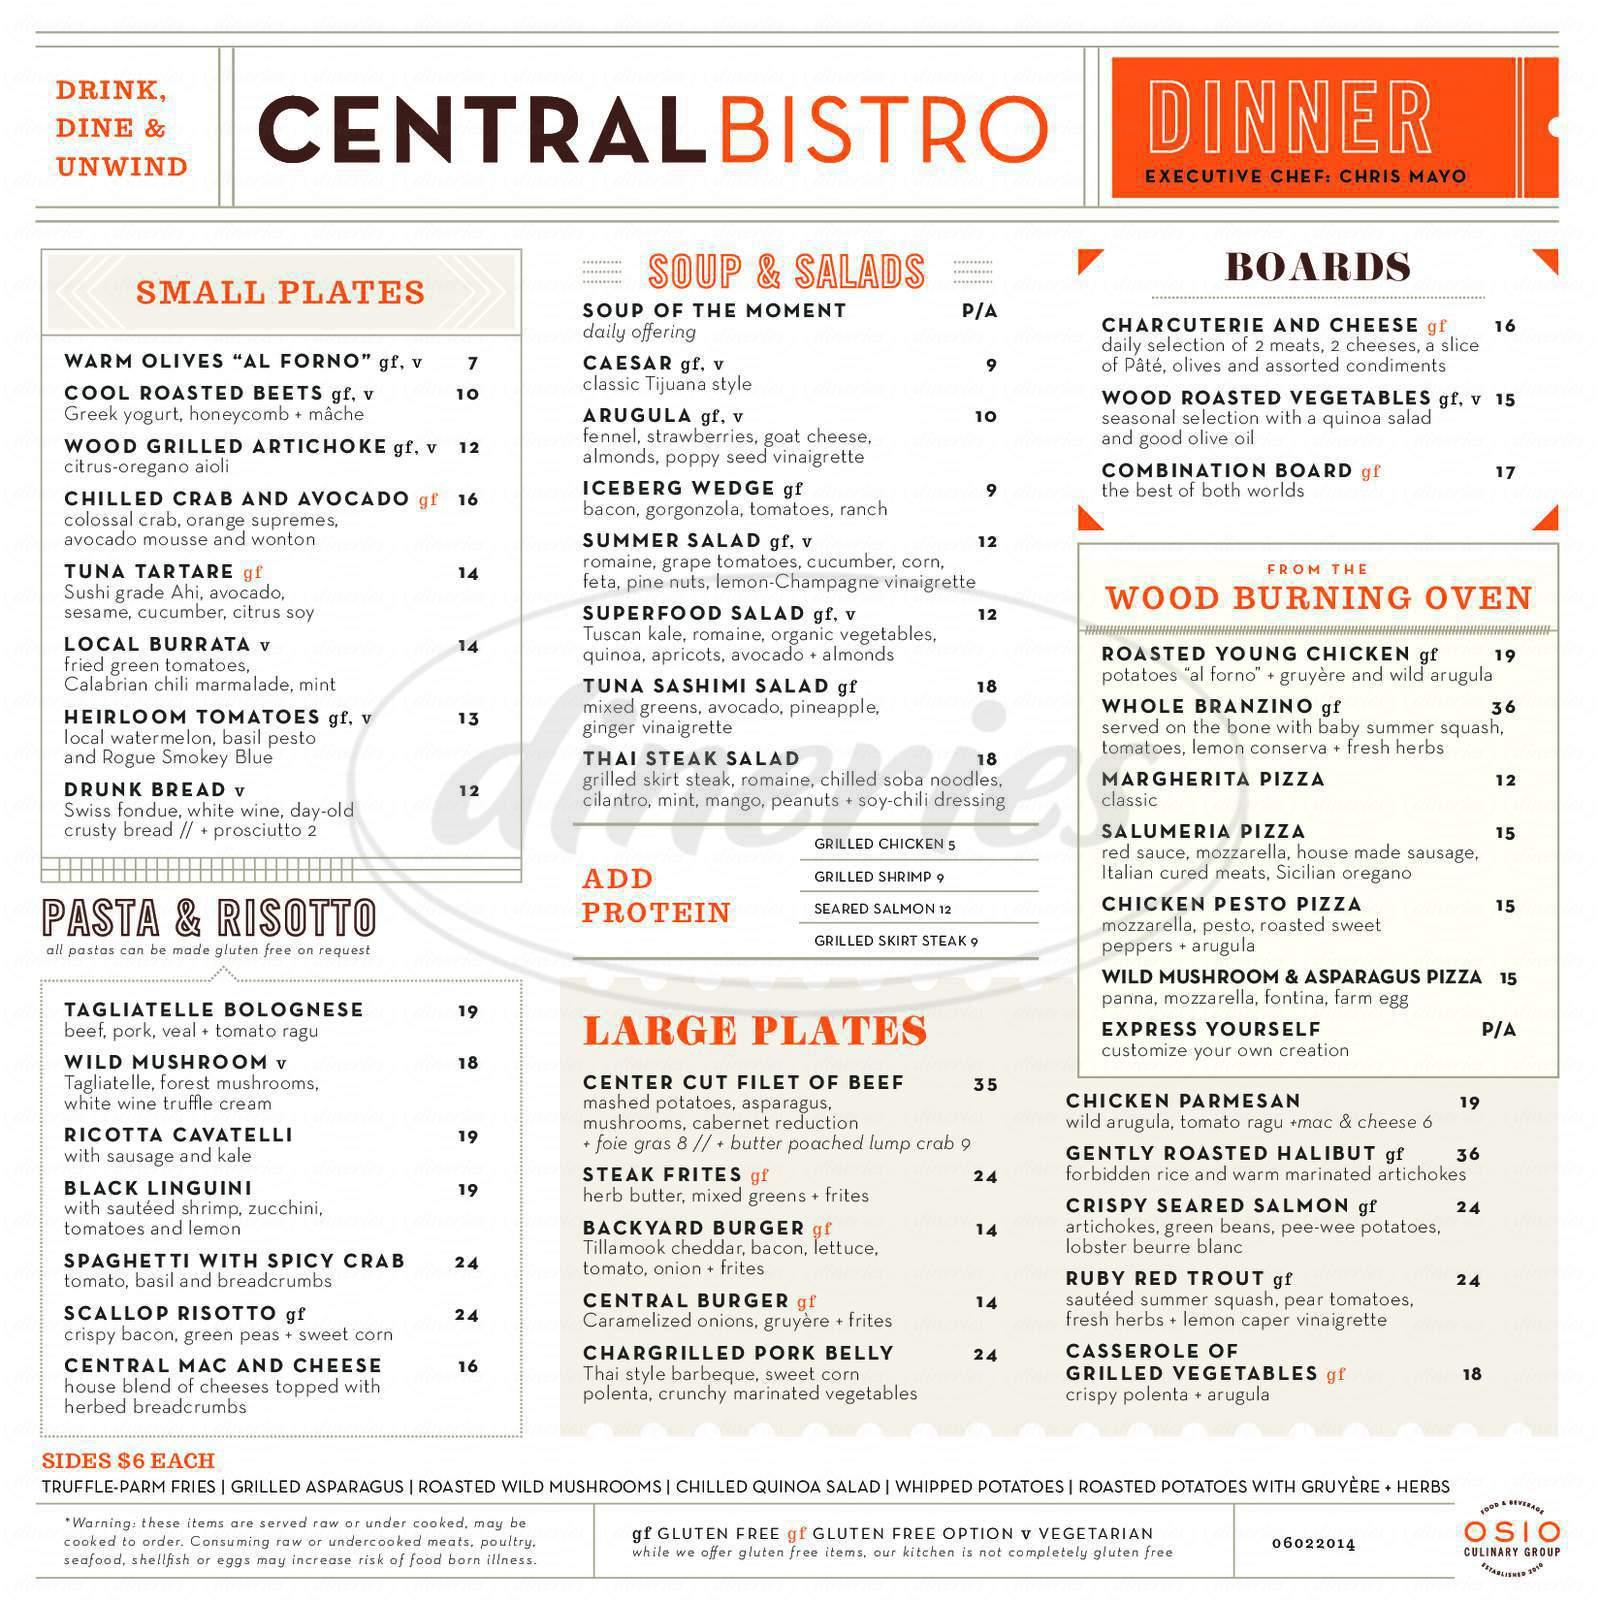 menu for Central Bistro